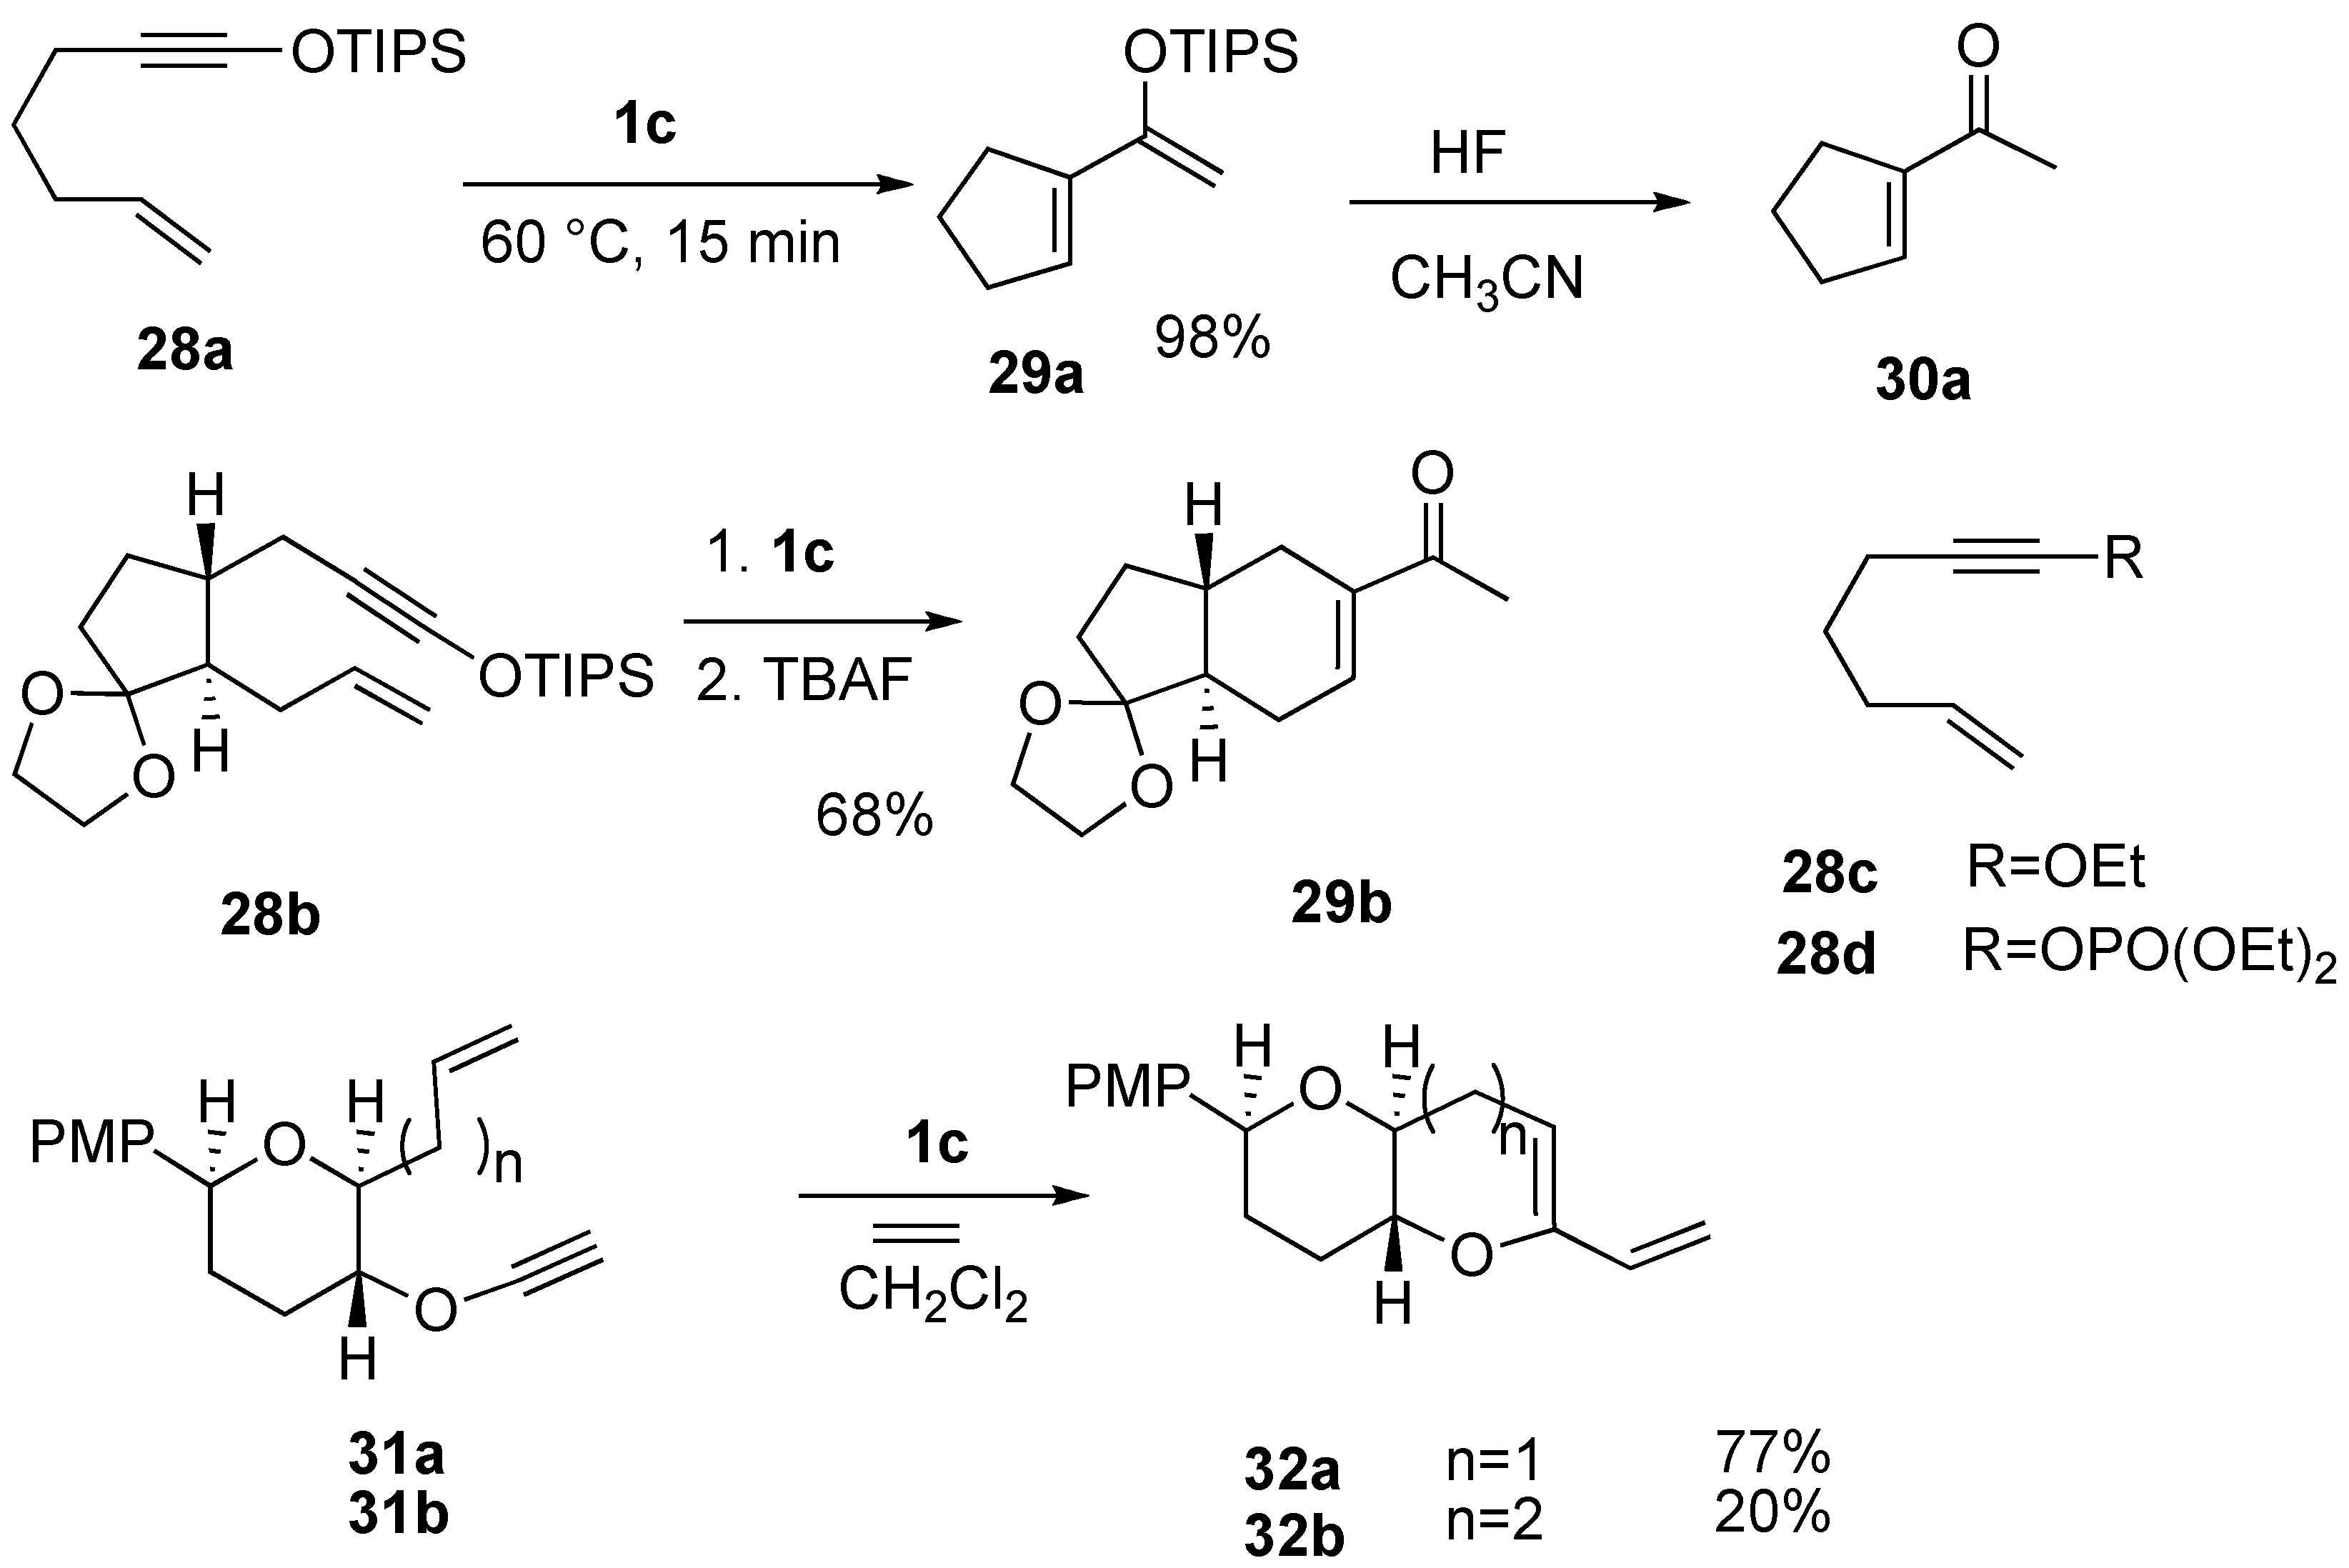 ruthenium metathesis mechanism